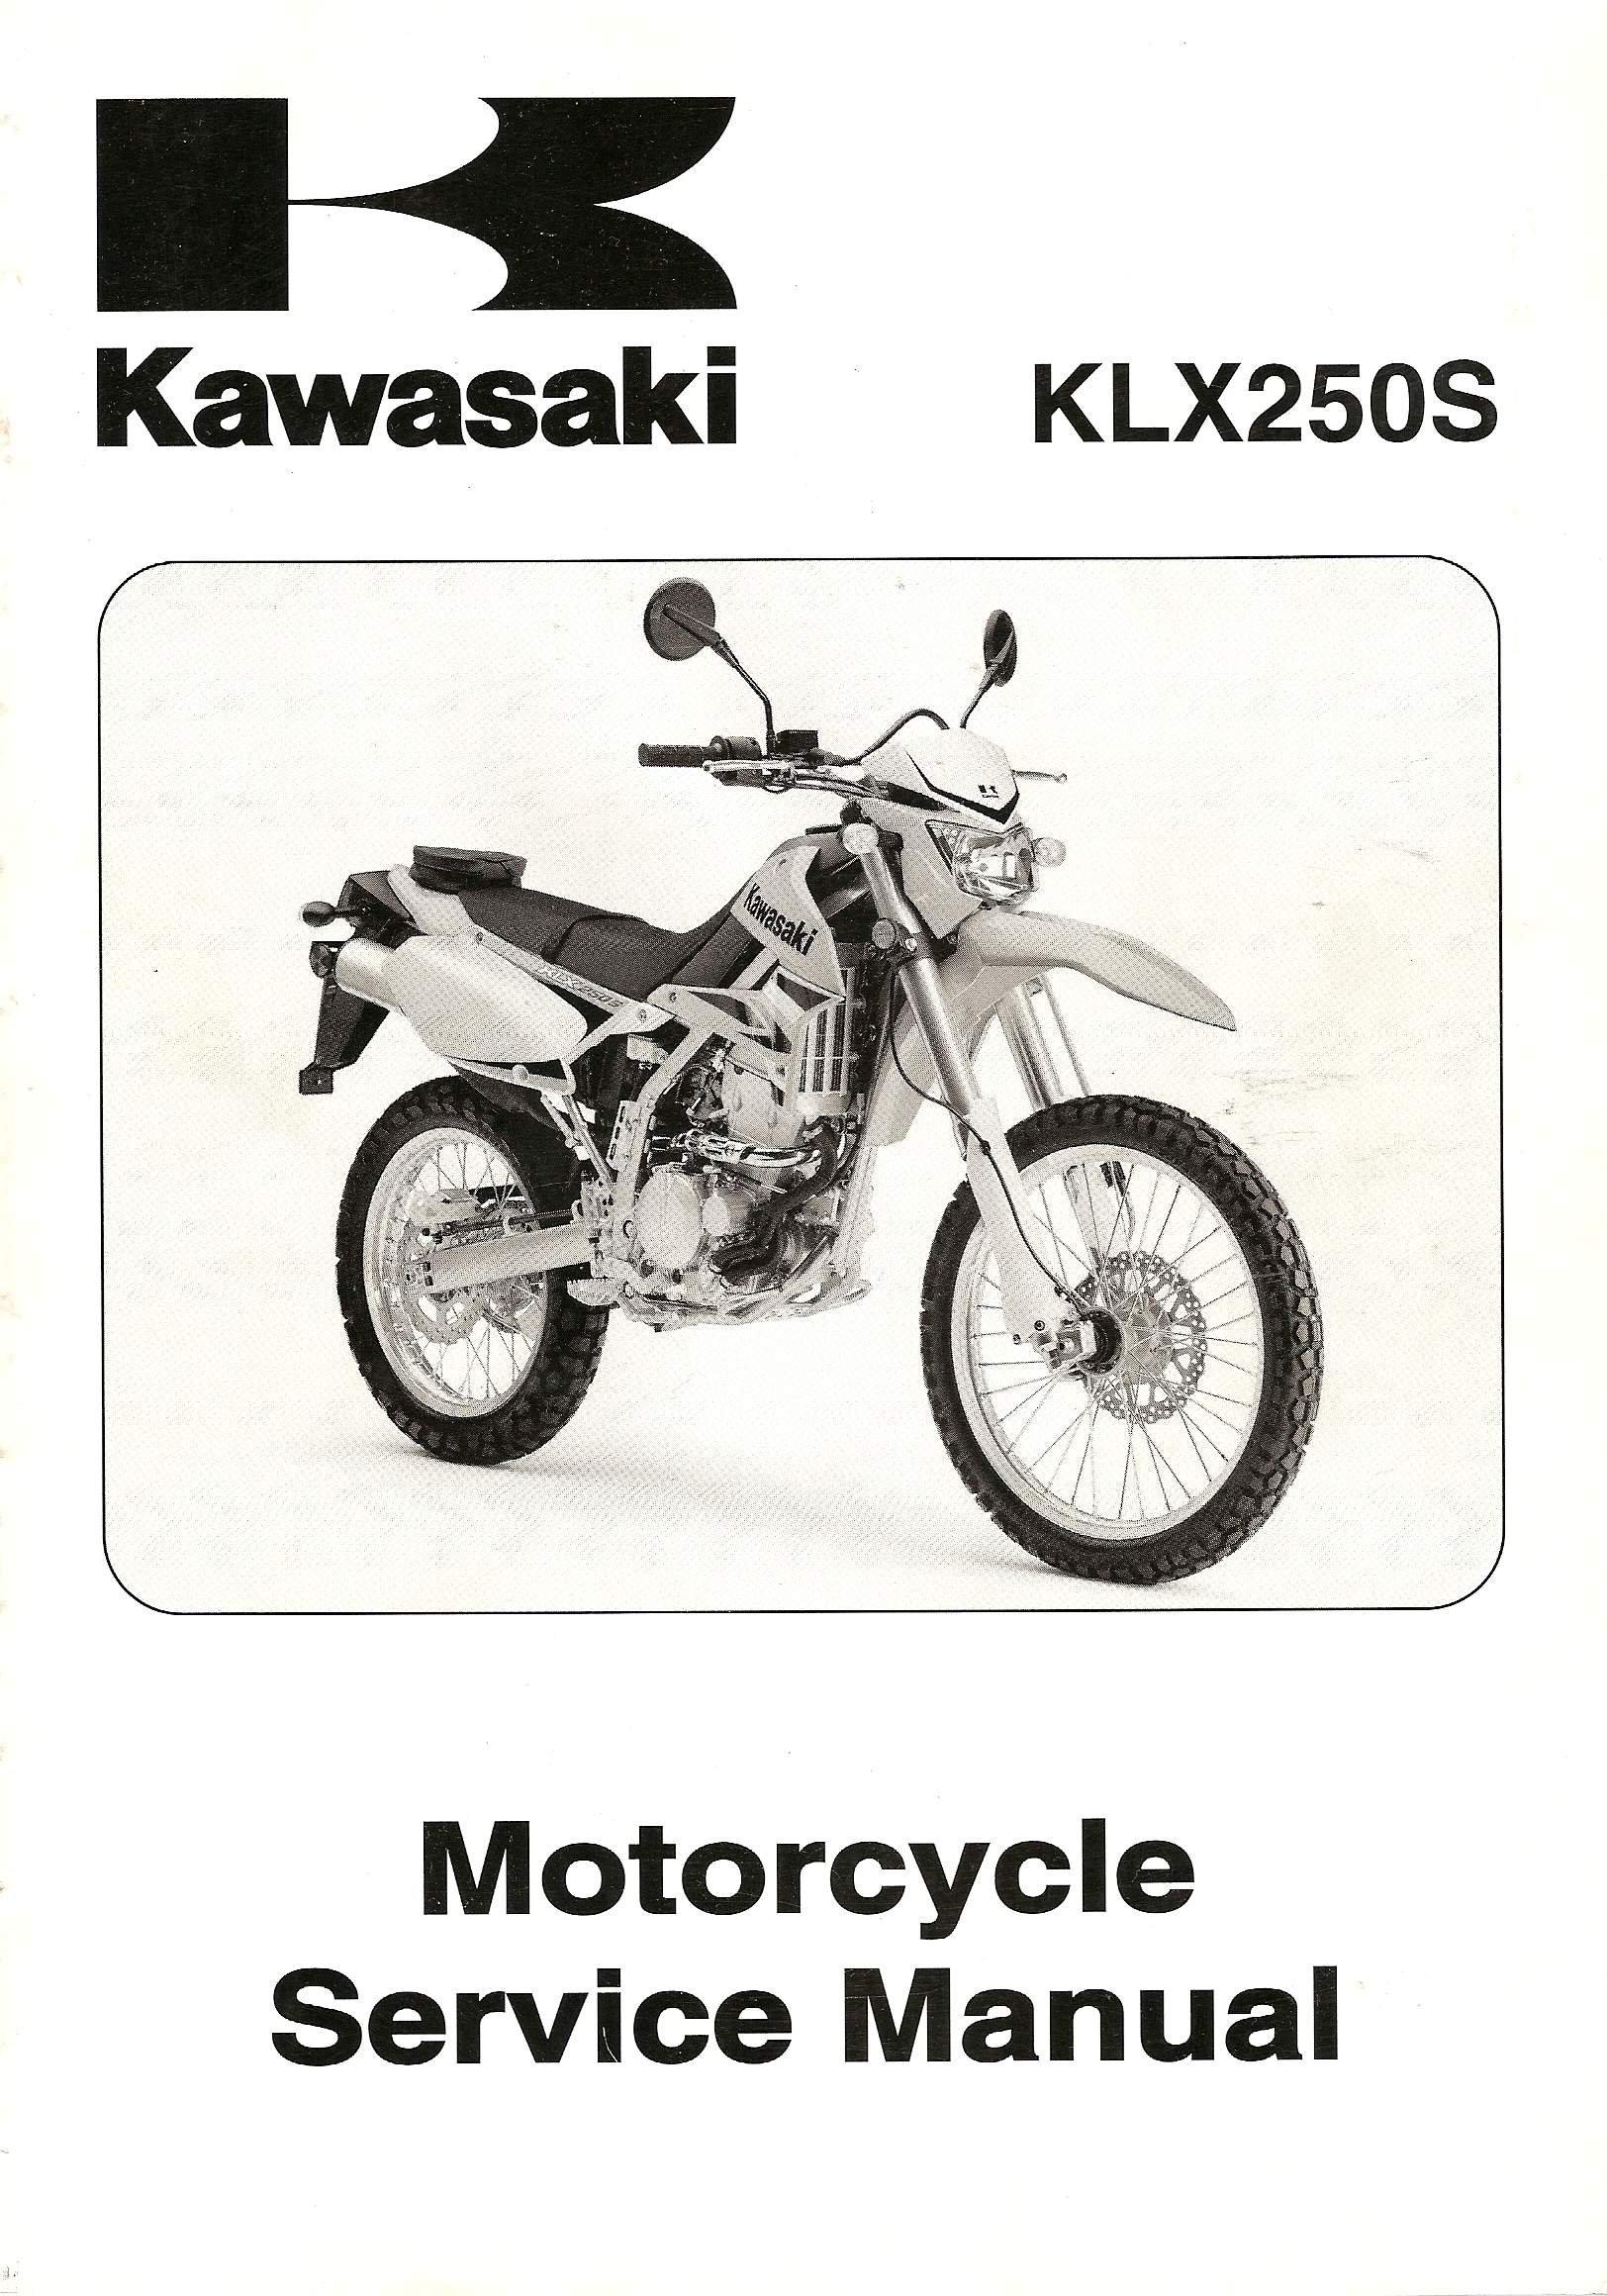 kawasaki klx250s motorcycle service manual 2009 kawasaki amazon rh amazon com 2009 kawasaki klx 250 service manual kawasaki klr 250 owners manual